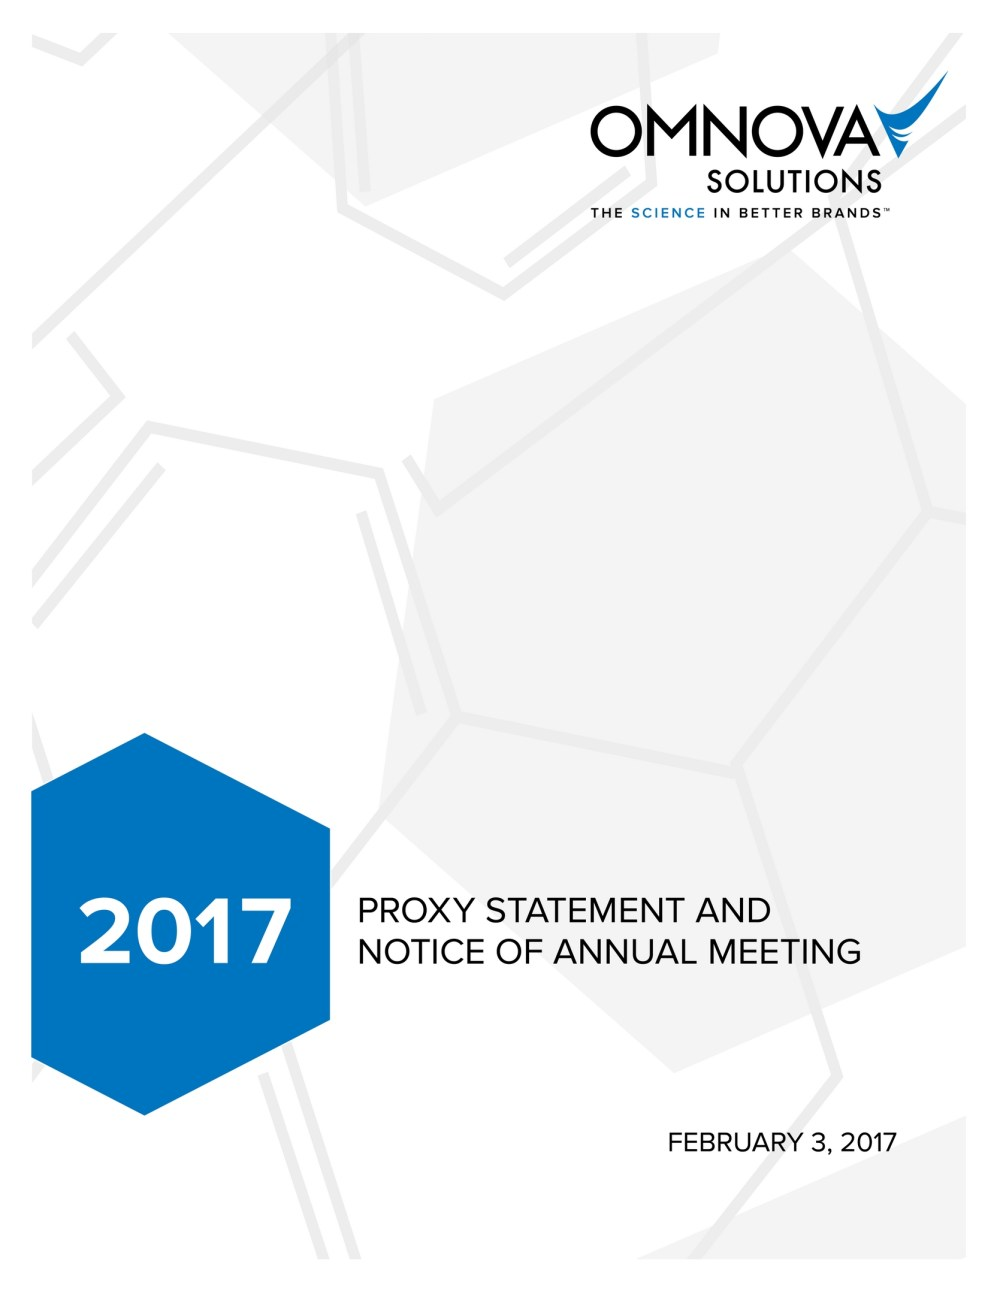 medium resolution of proxycover2017 jpg